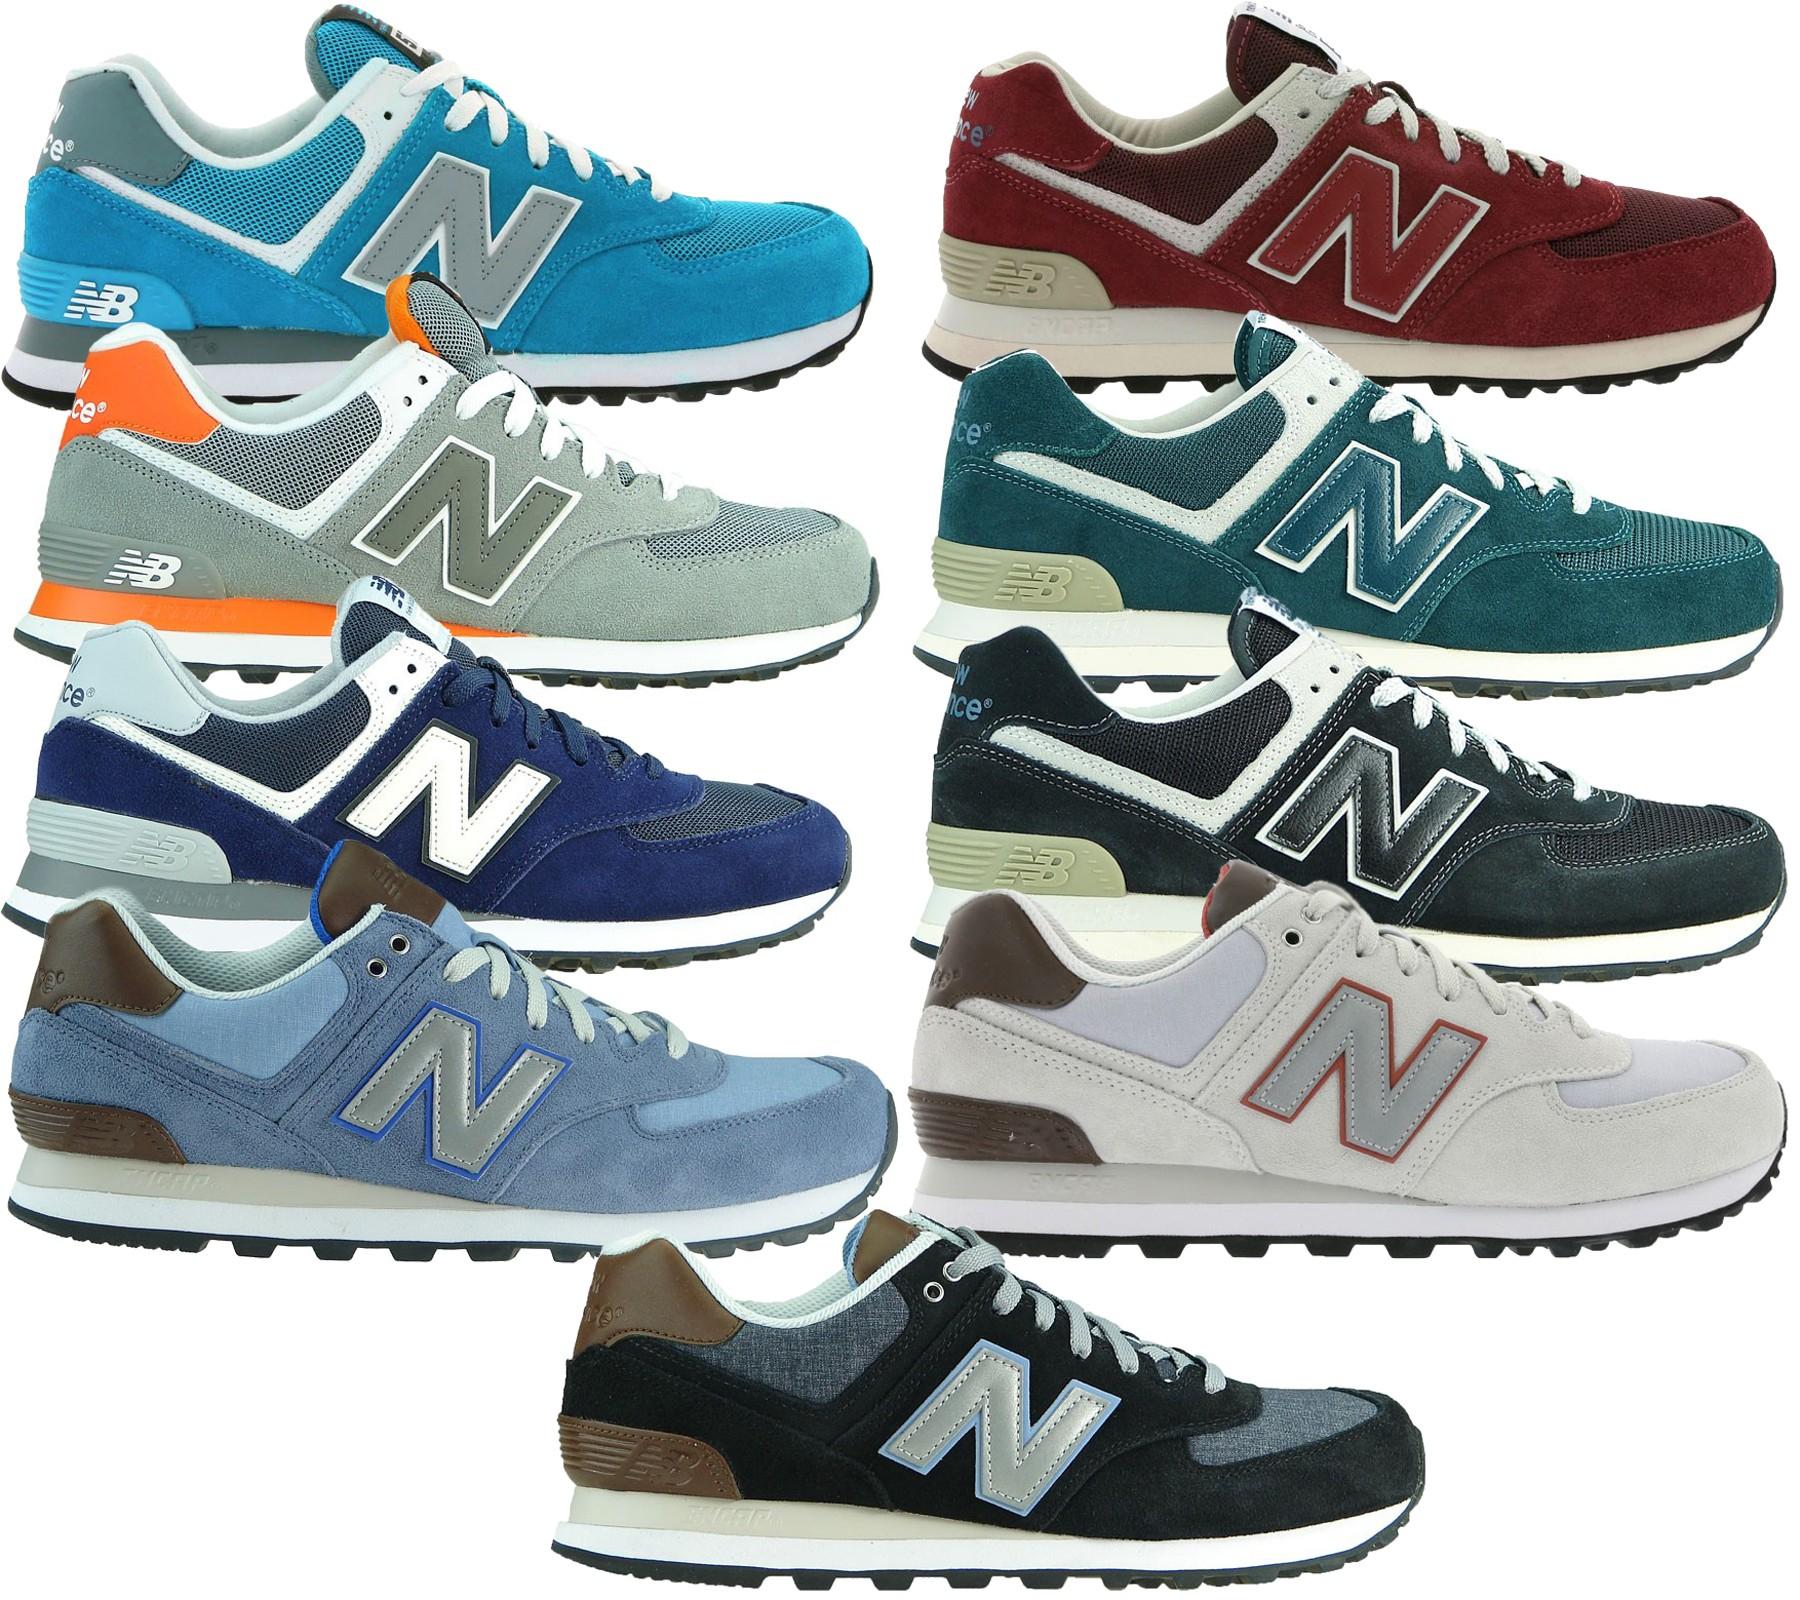 New Balance Sneakers bei Ebay für 54,99€ inkl. Versand